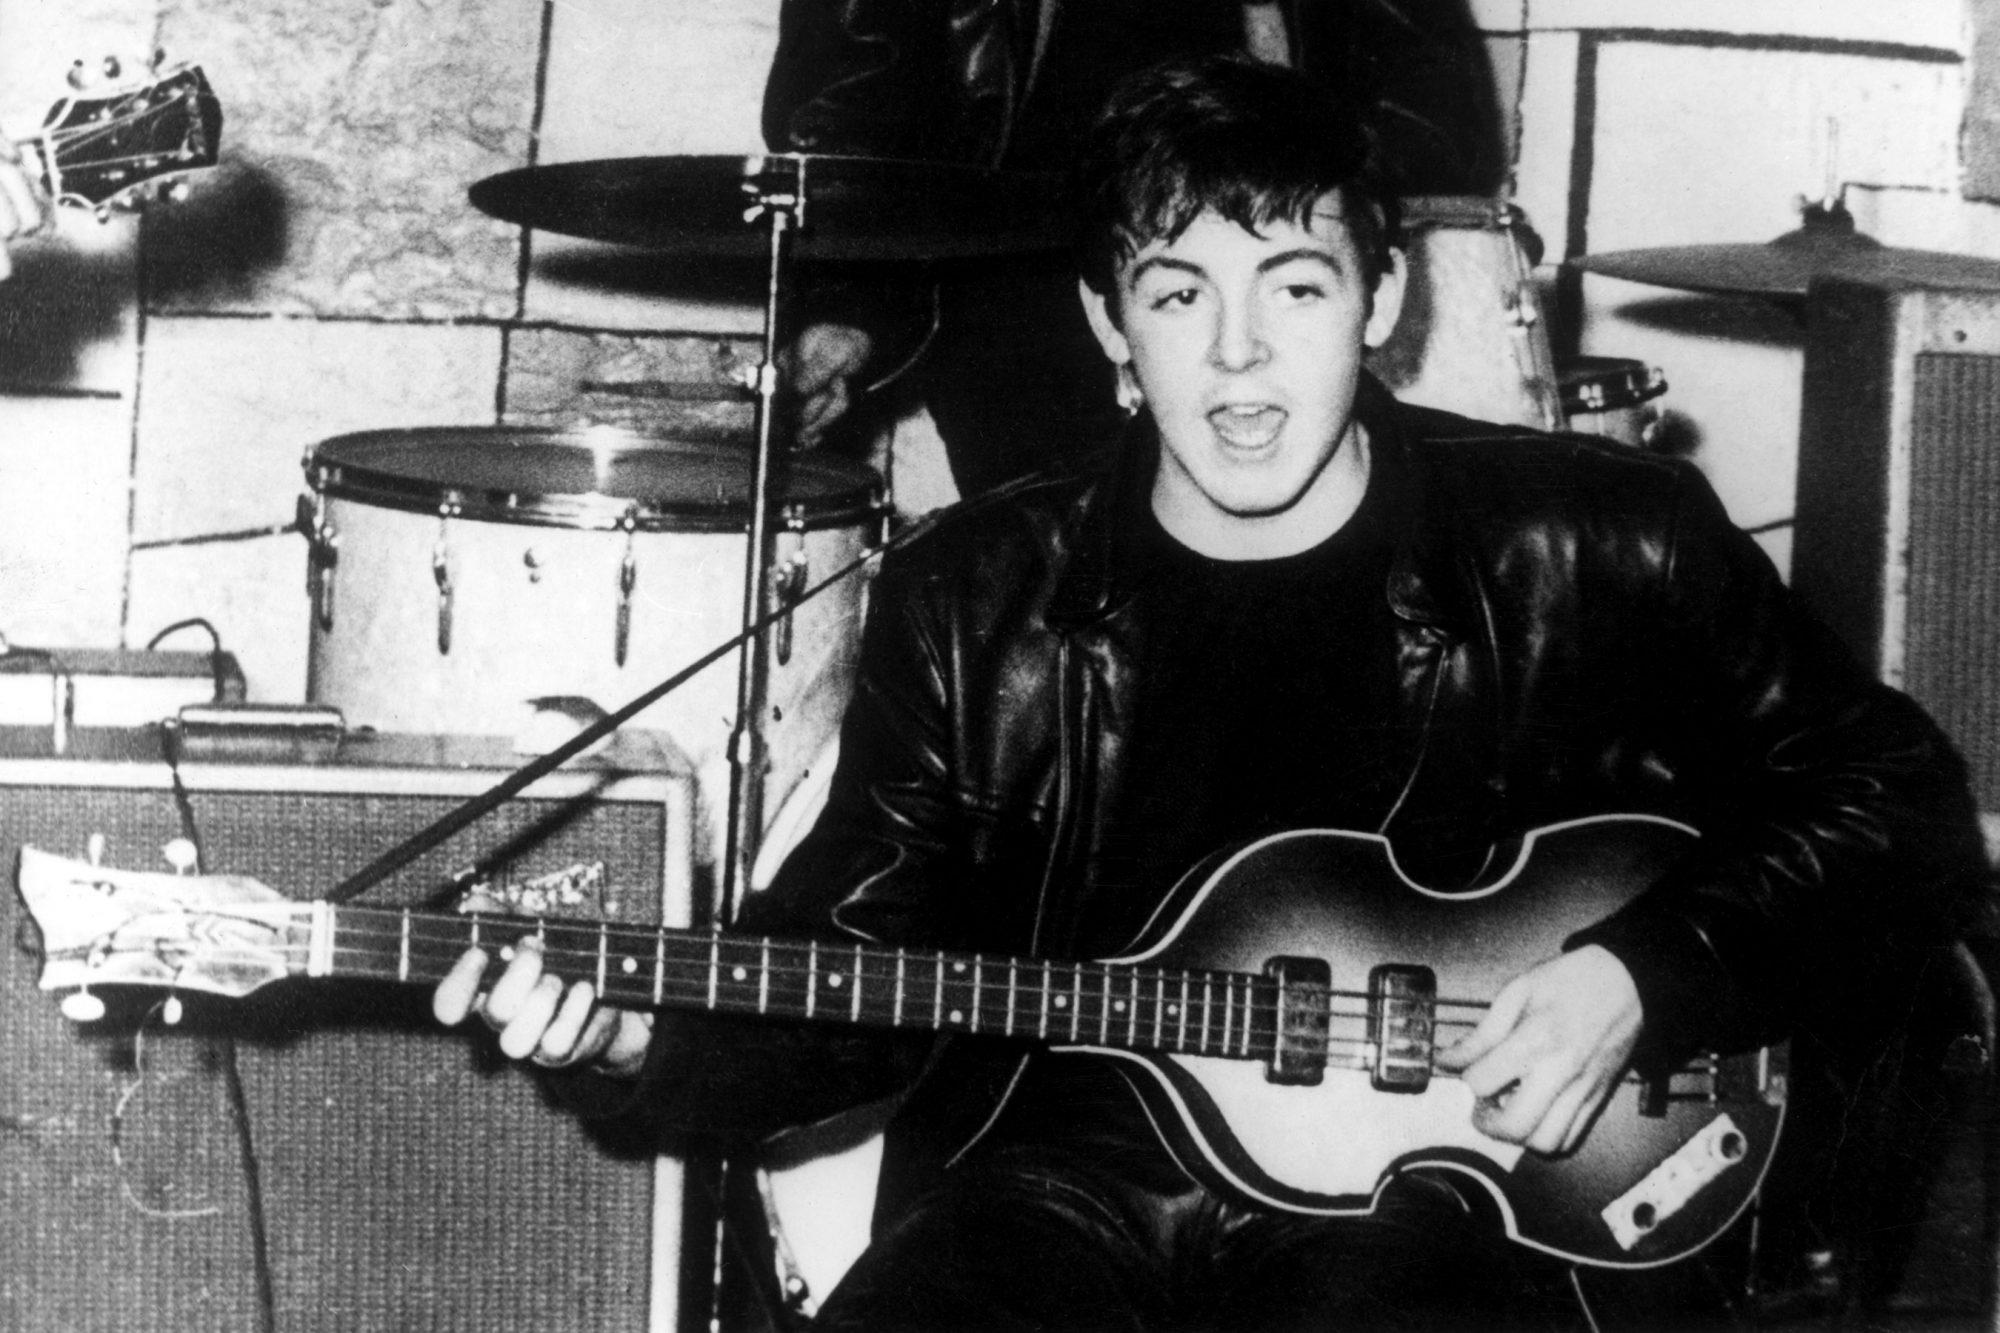 McCartney's Cavern